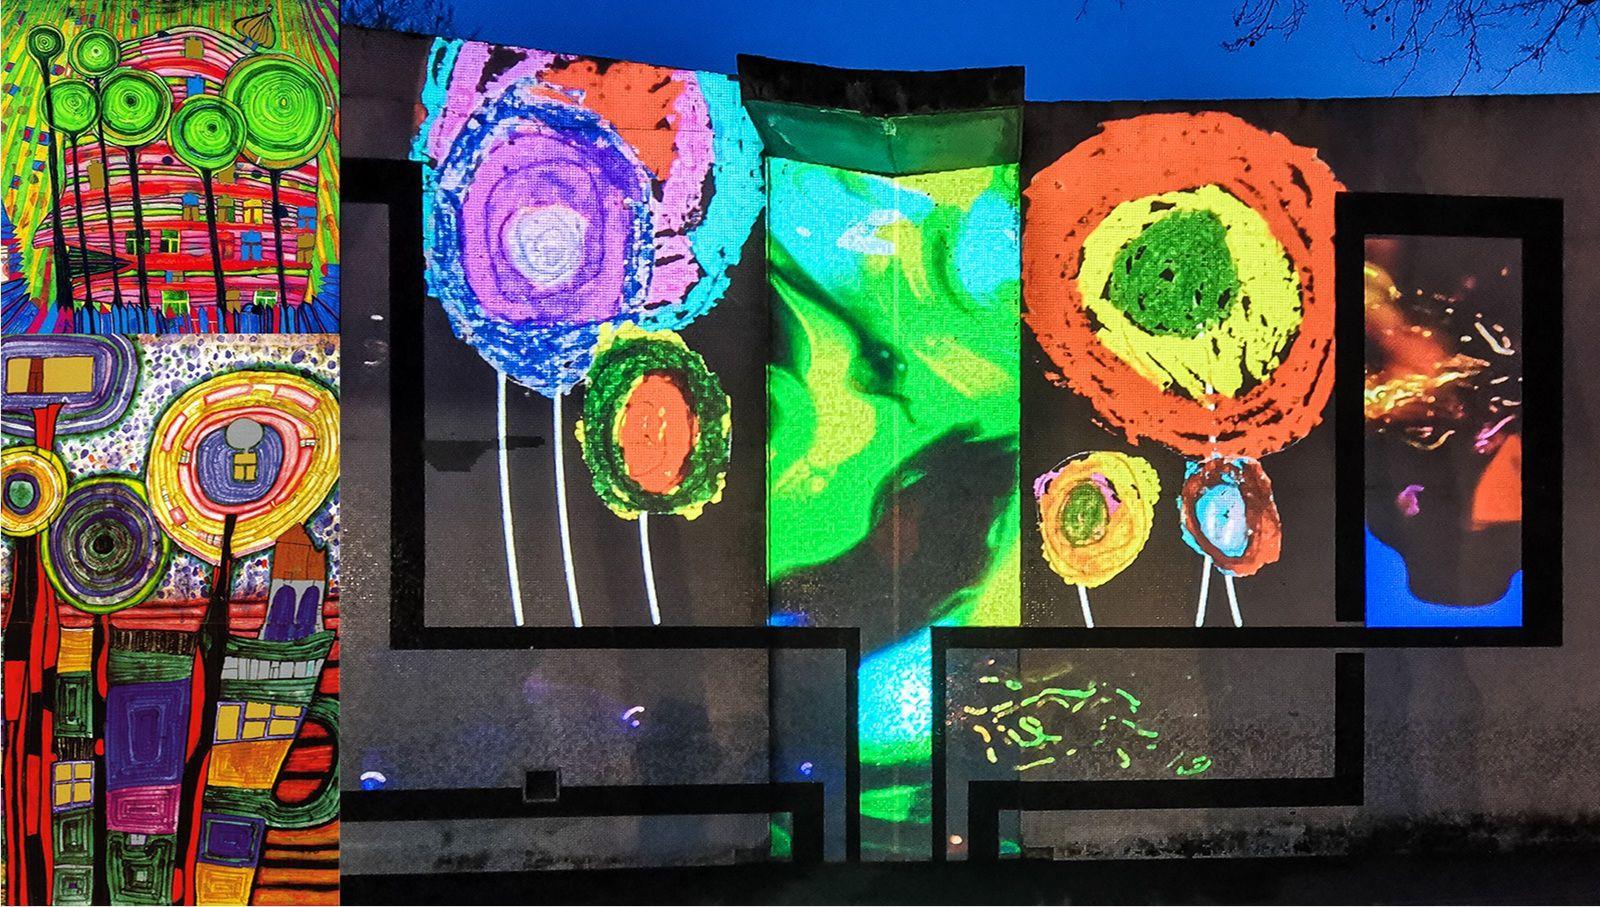 Les « Lollipop trees » d'Hundertwasser